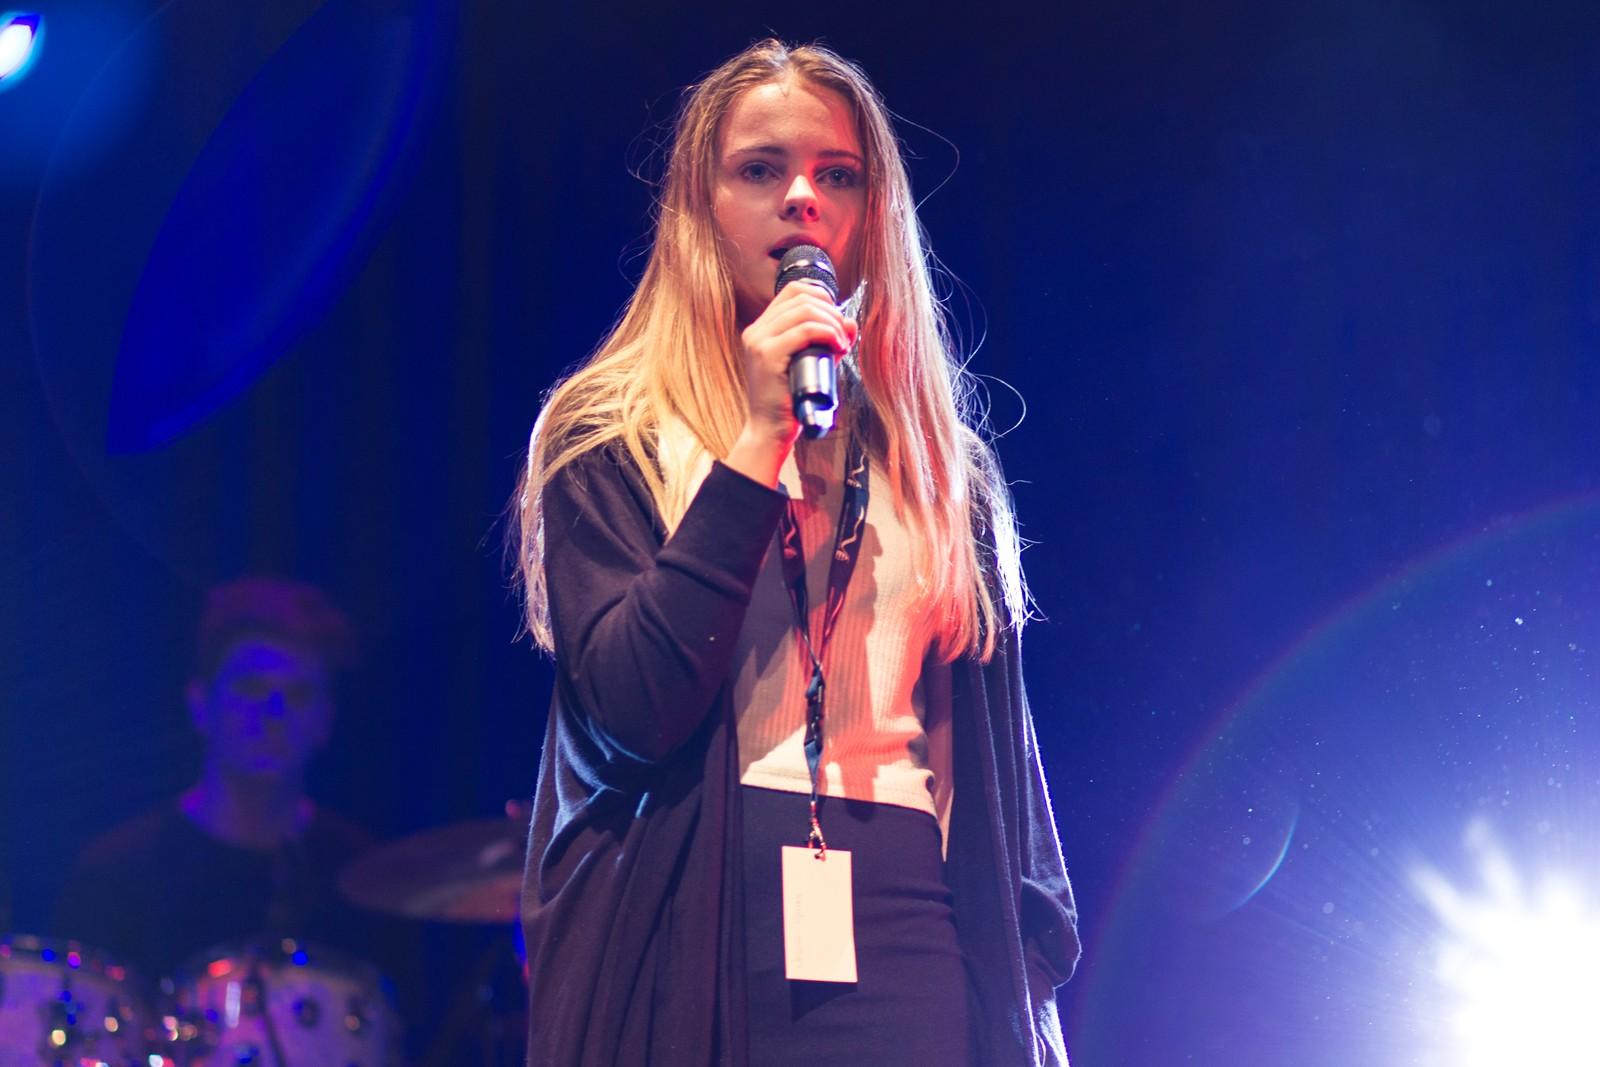 AURLAND: Jessica Gjernes - Stay